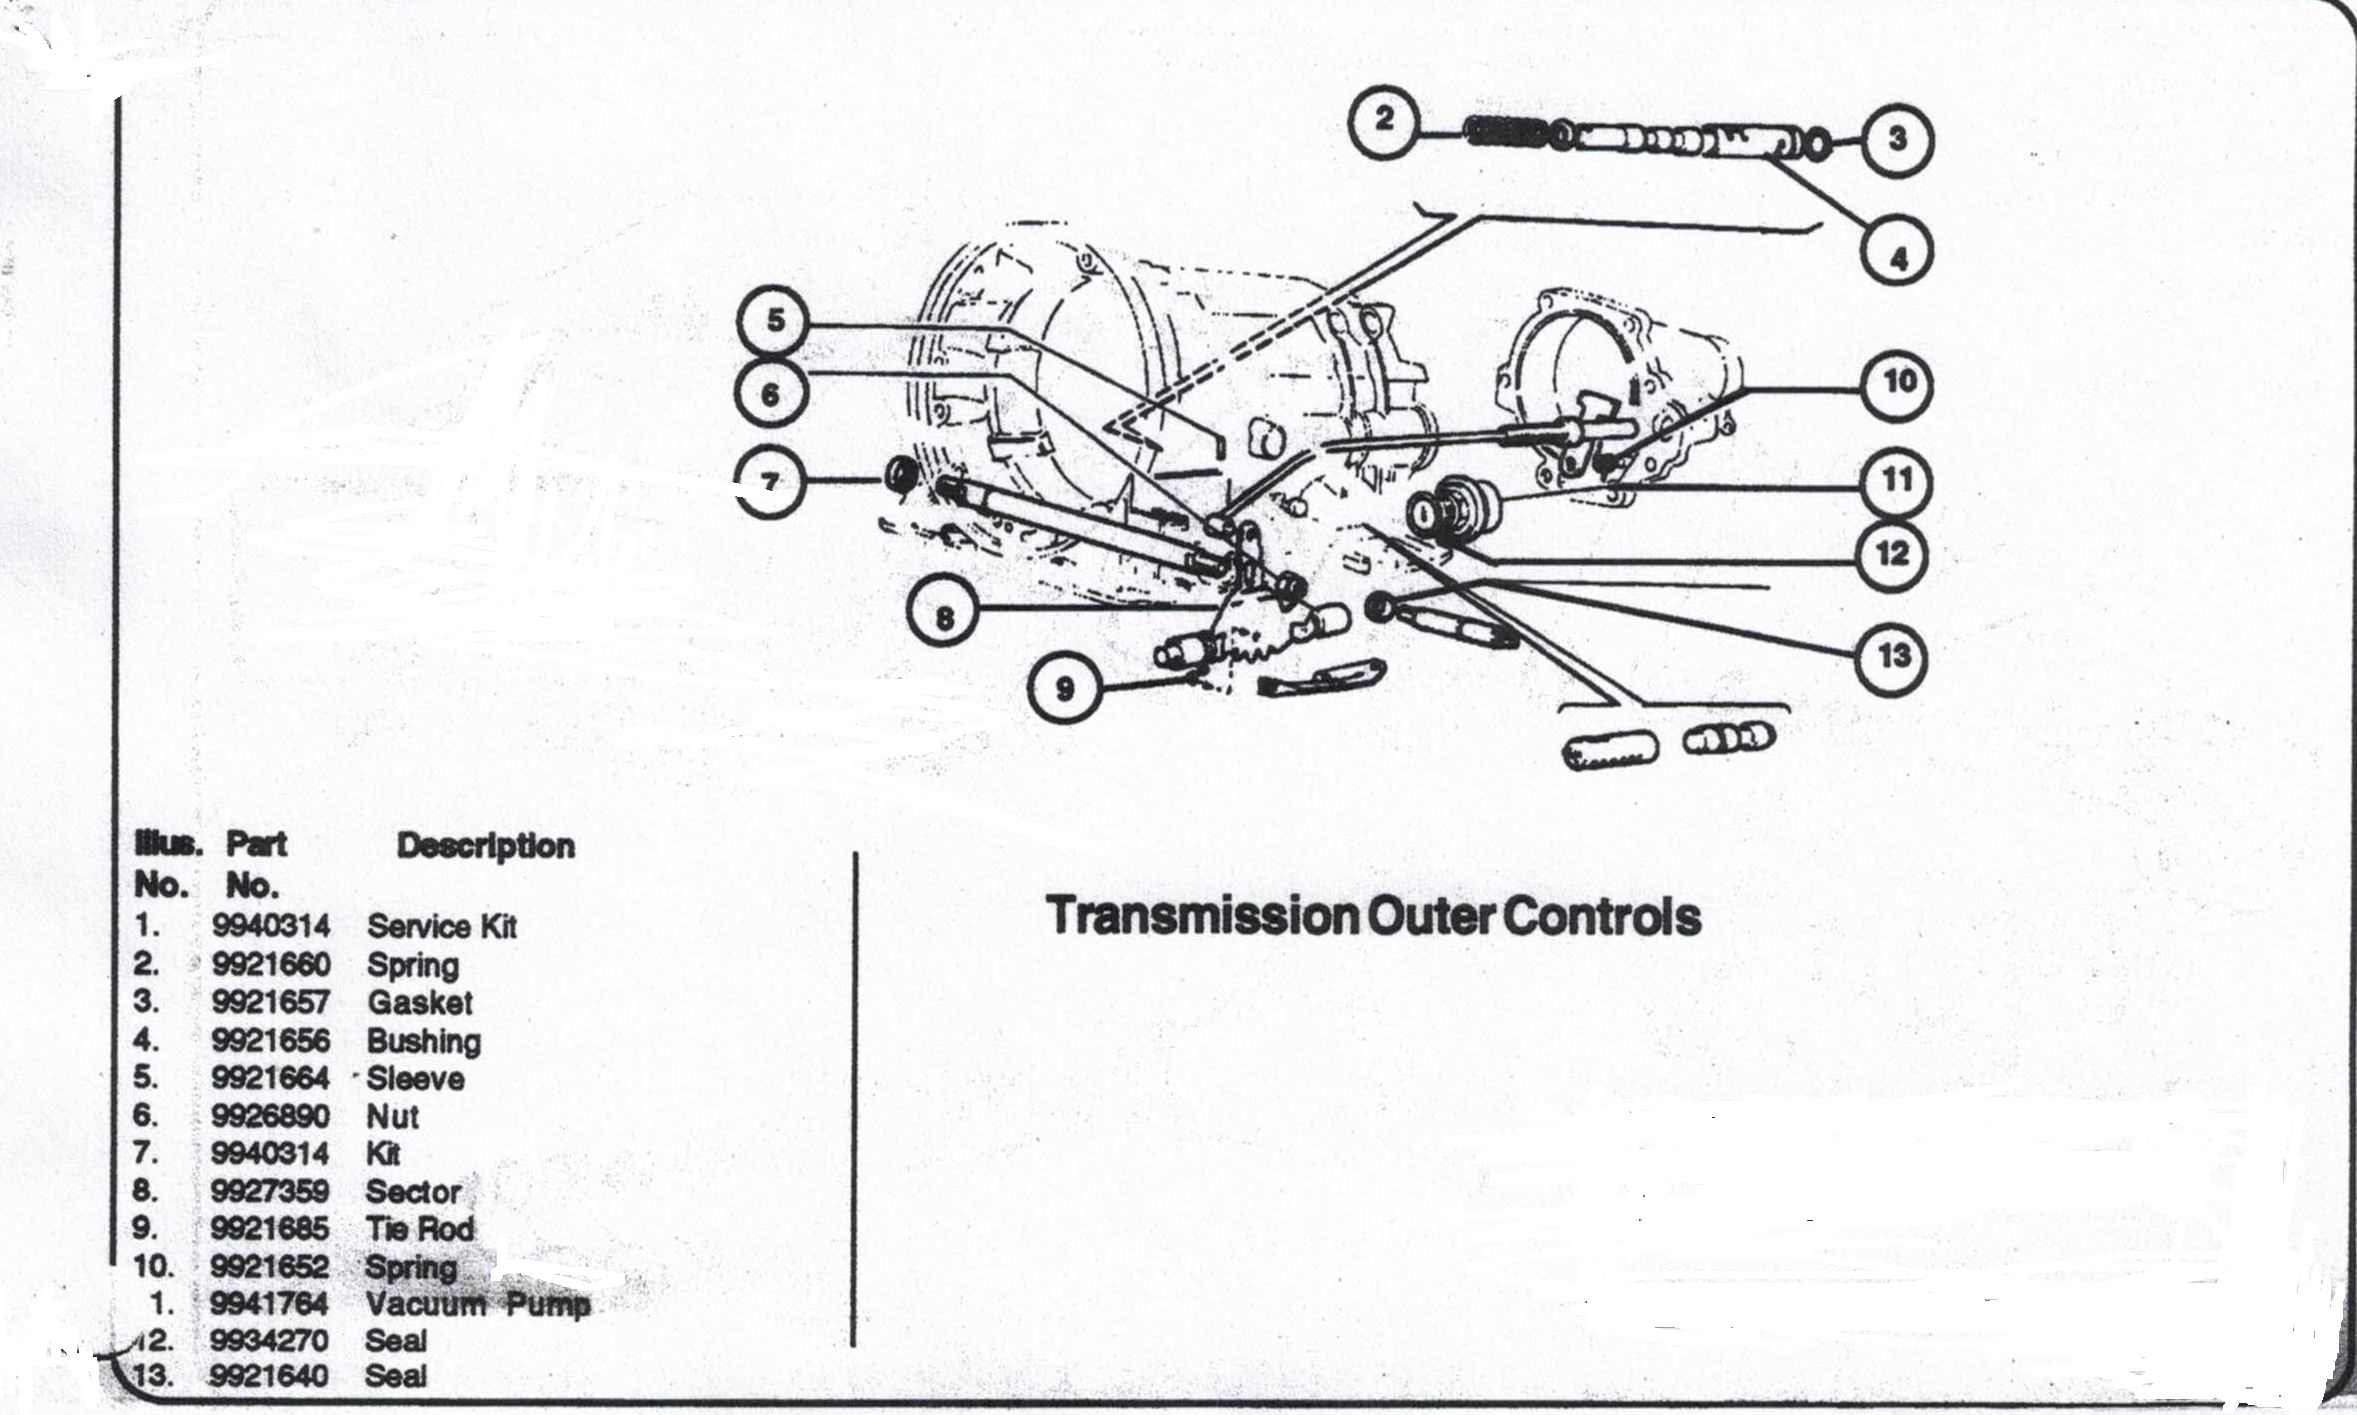 Fiat SpiderTransmission